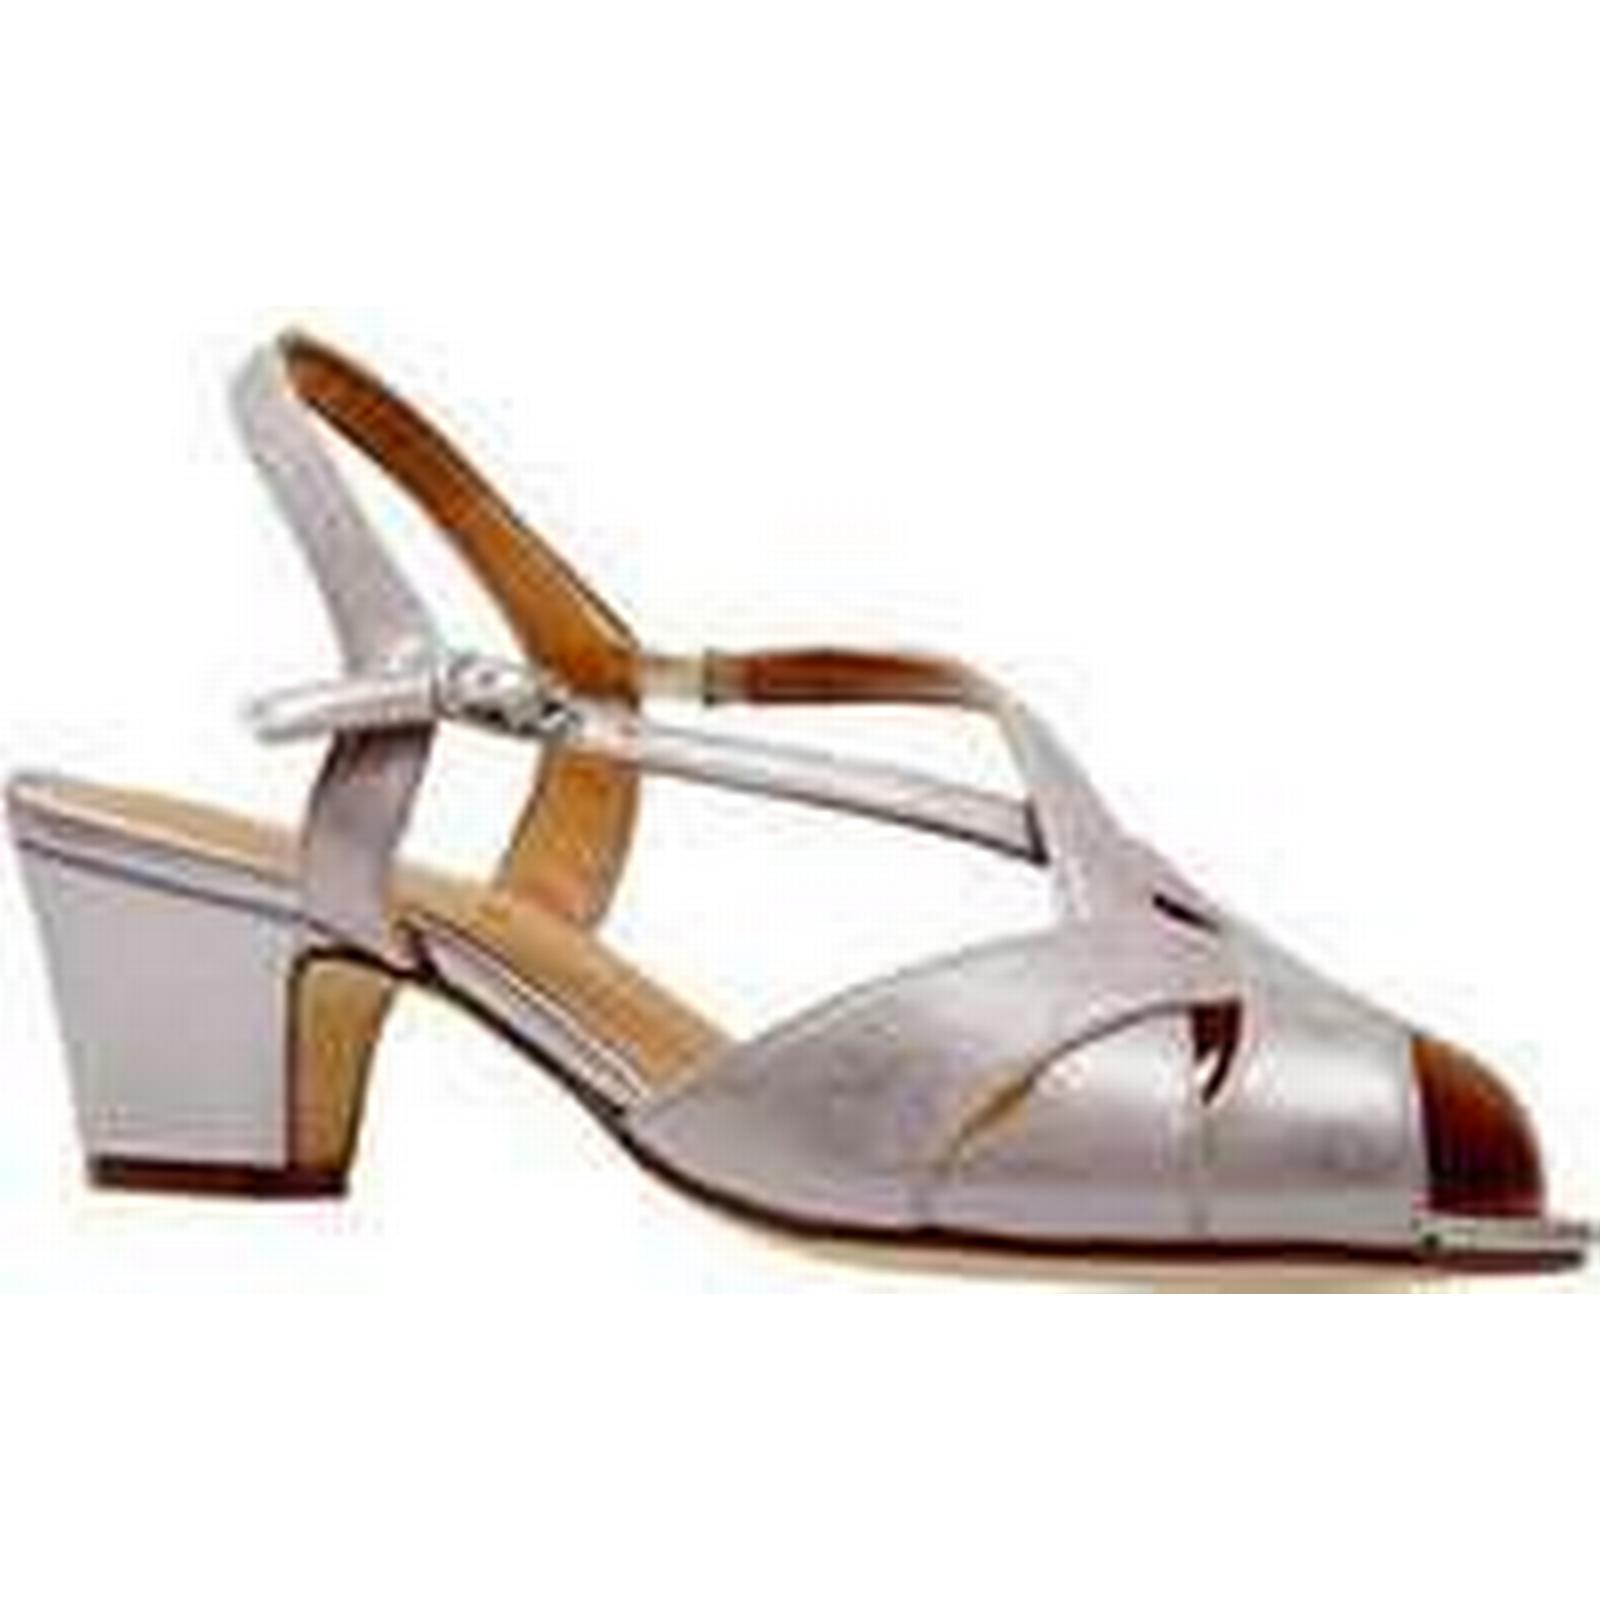 spartoo.co.uk van dal libby ii large digne des femmes sandales femmes des & #  ; s les sandales en argent 889e33